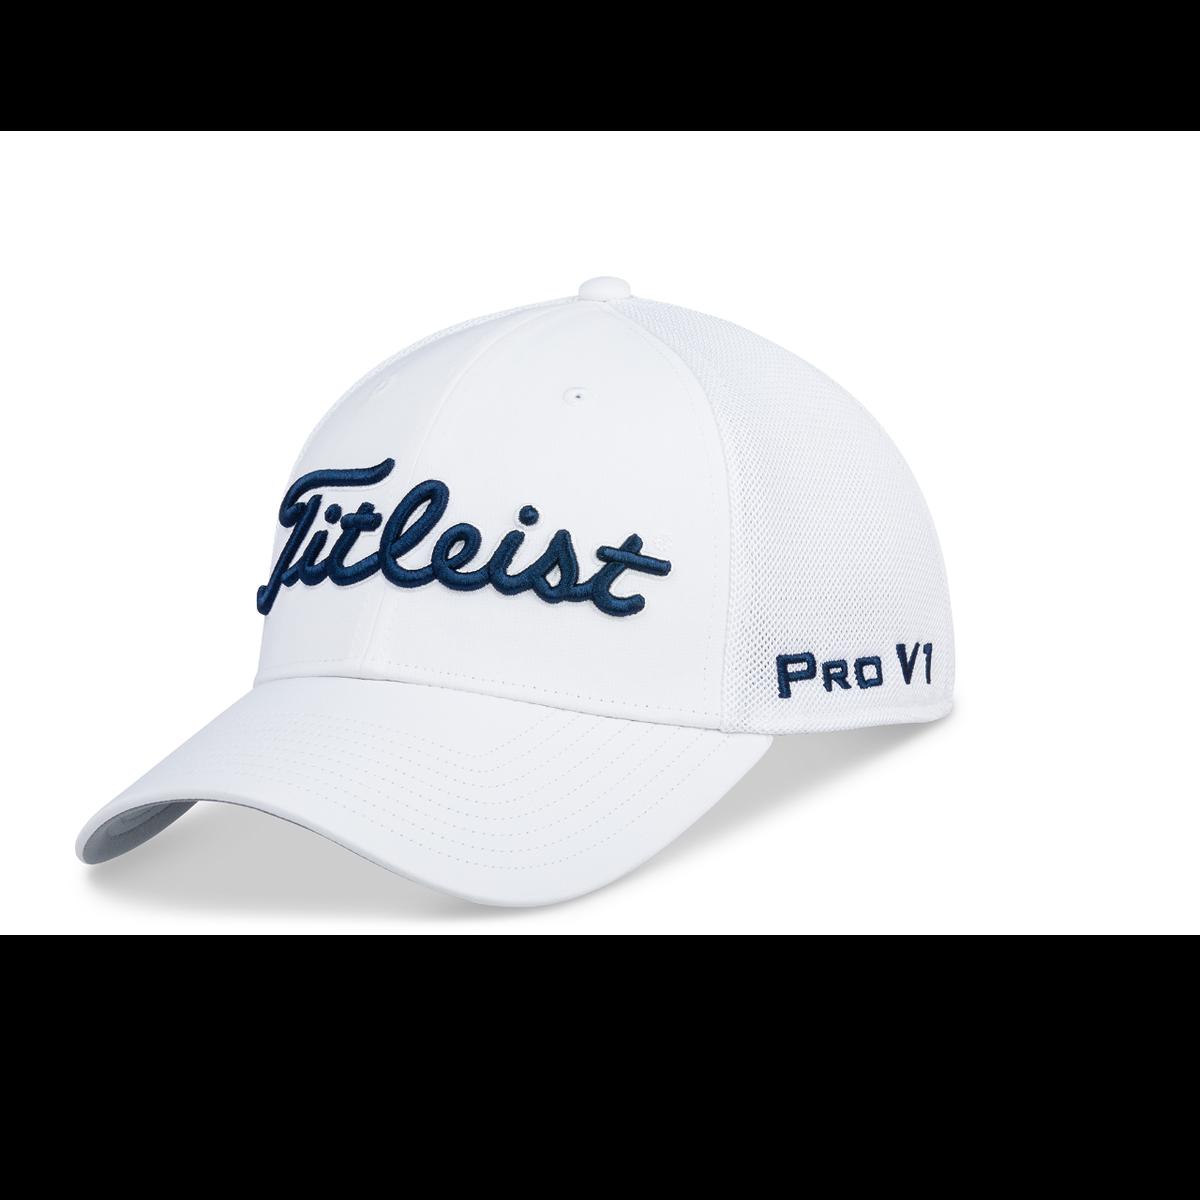 05bb3914dcc Titleist Tour Sports Mesh White Hat